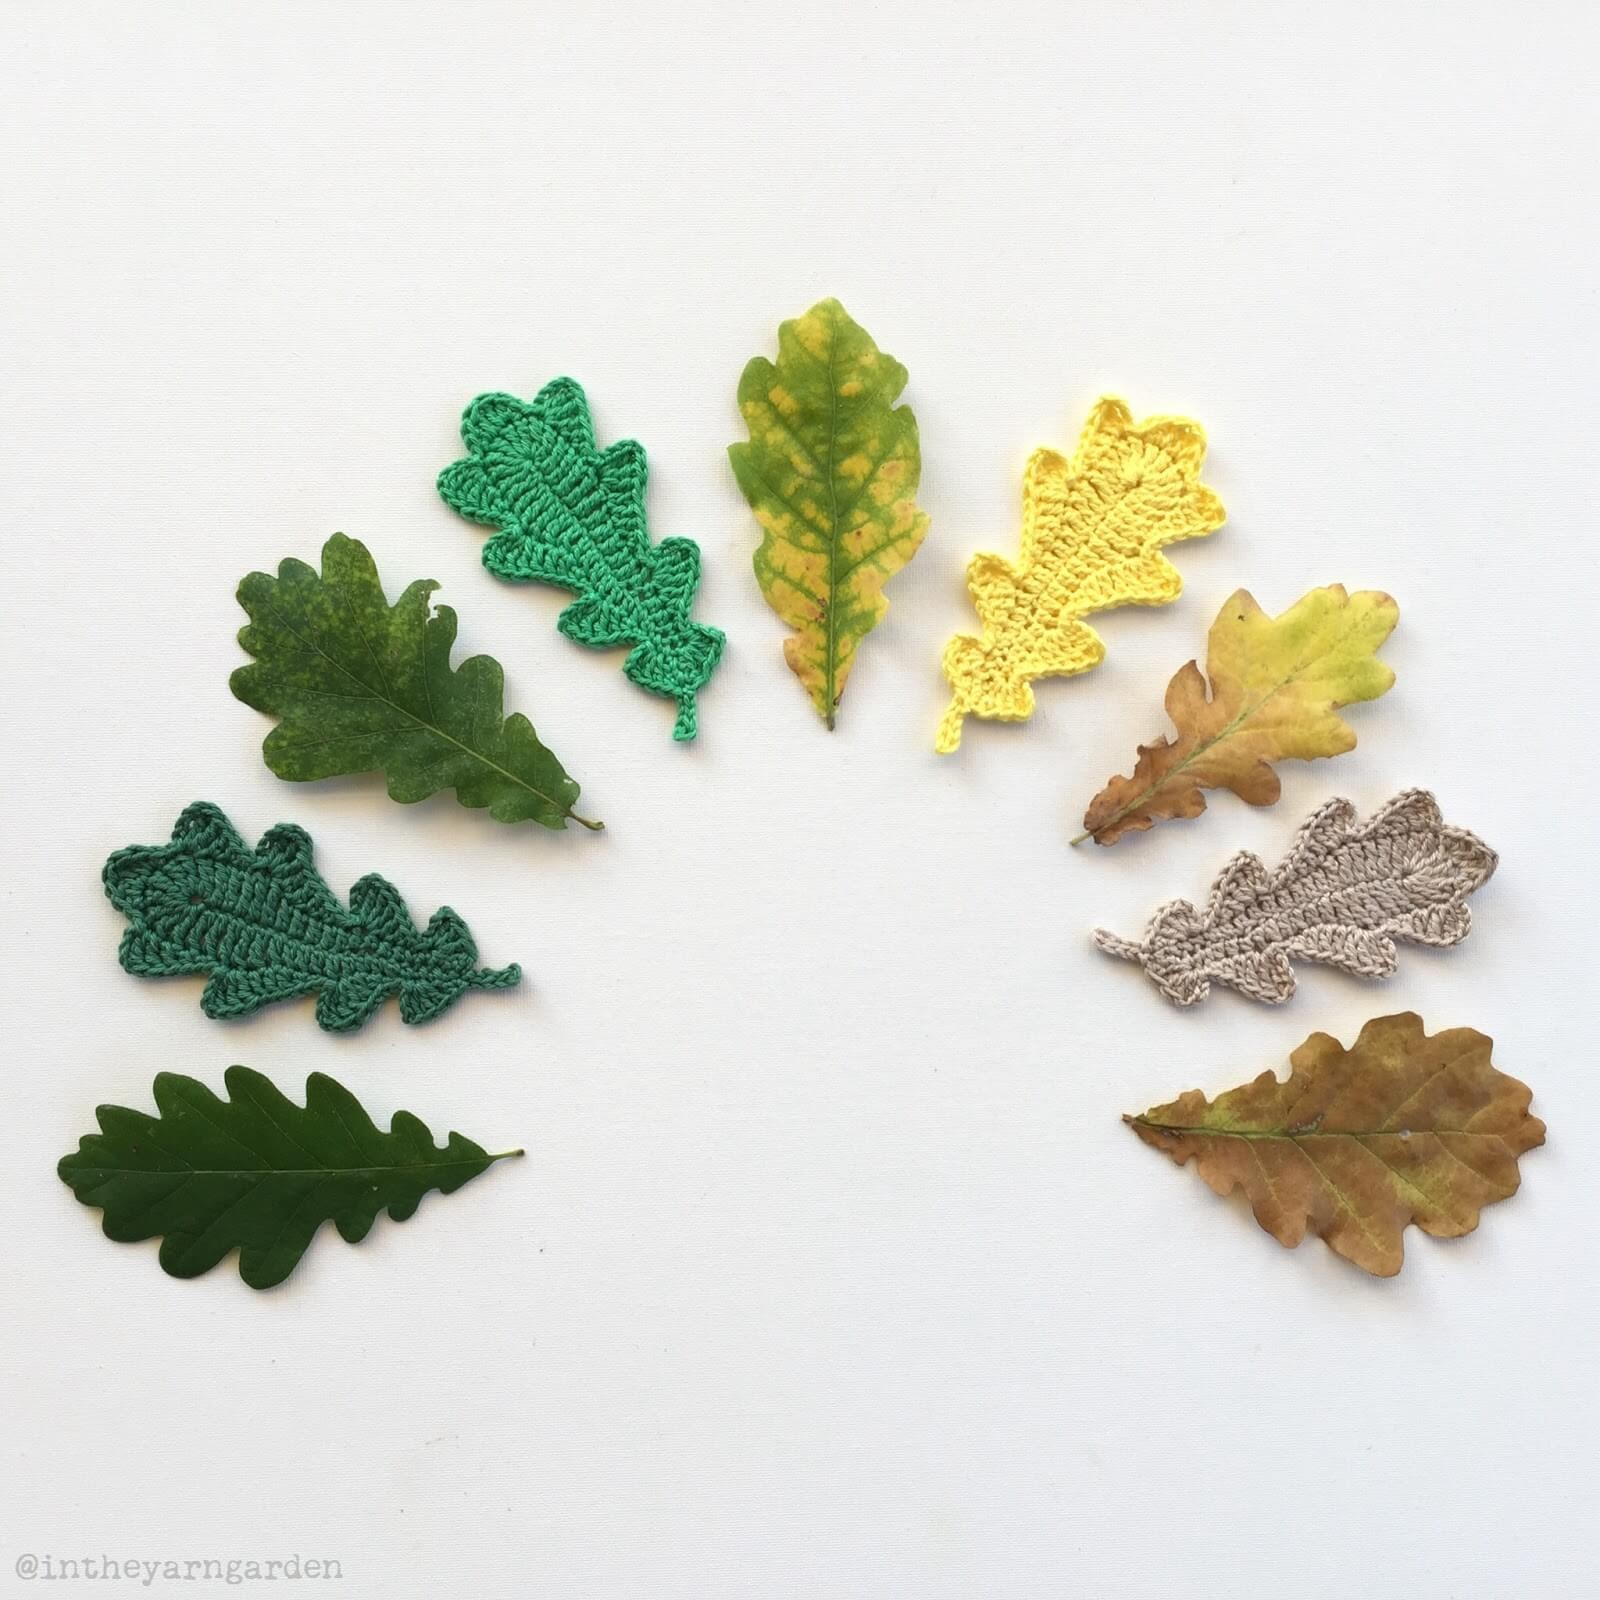 Вышивка дубовый лист